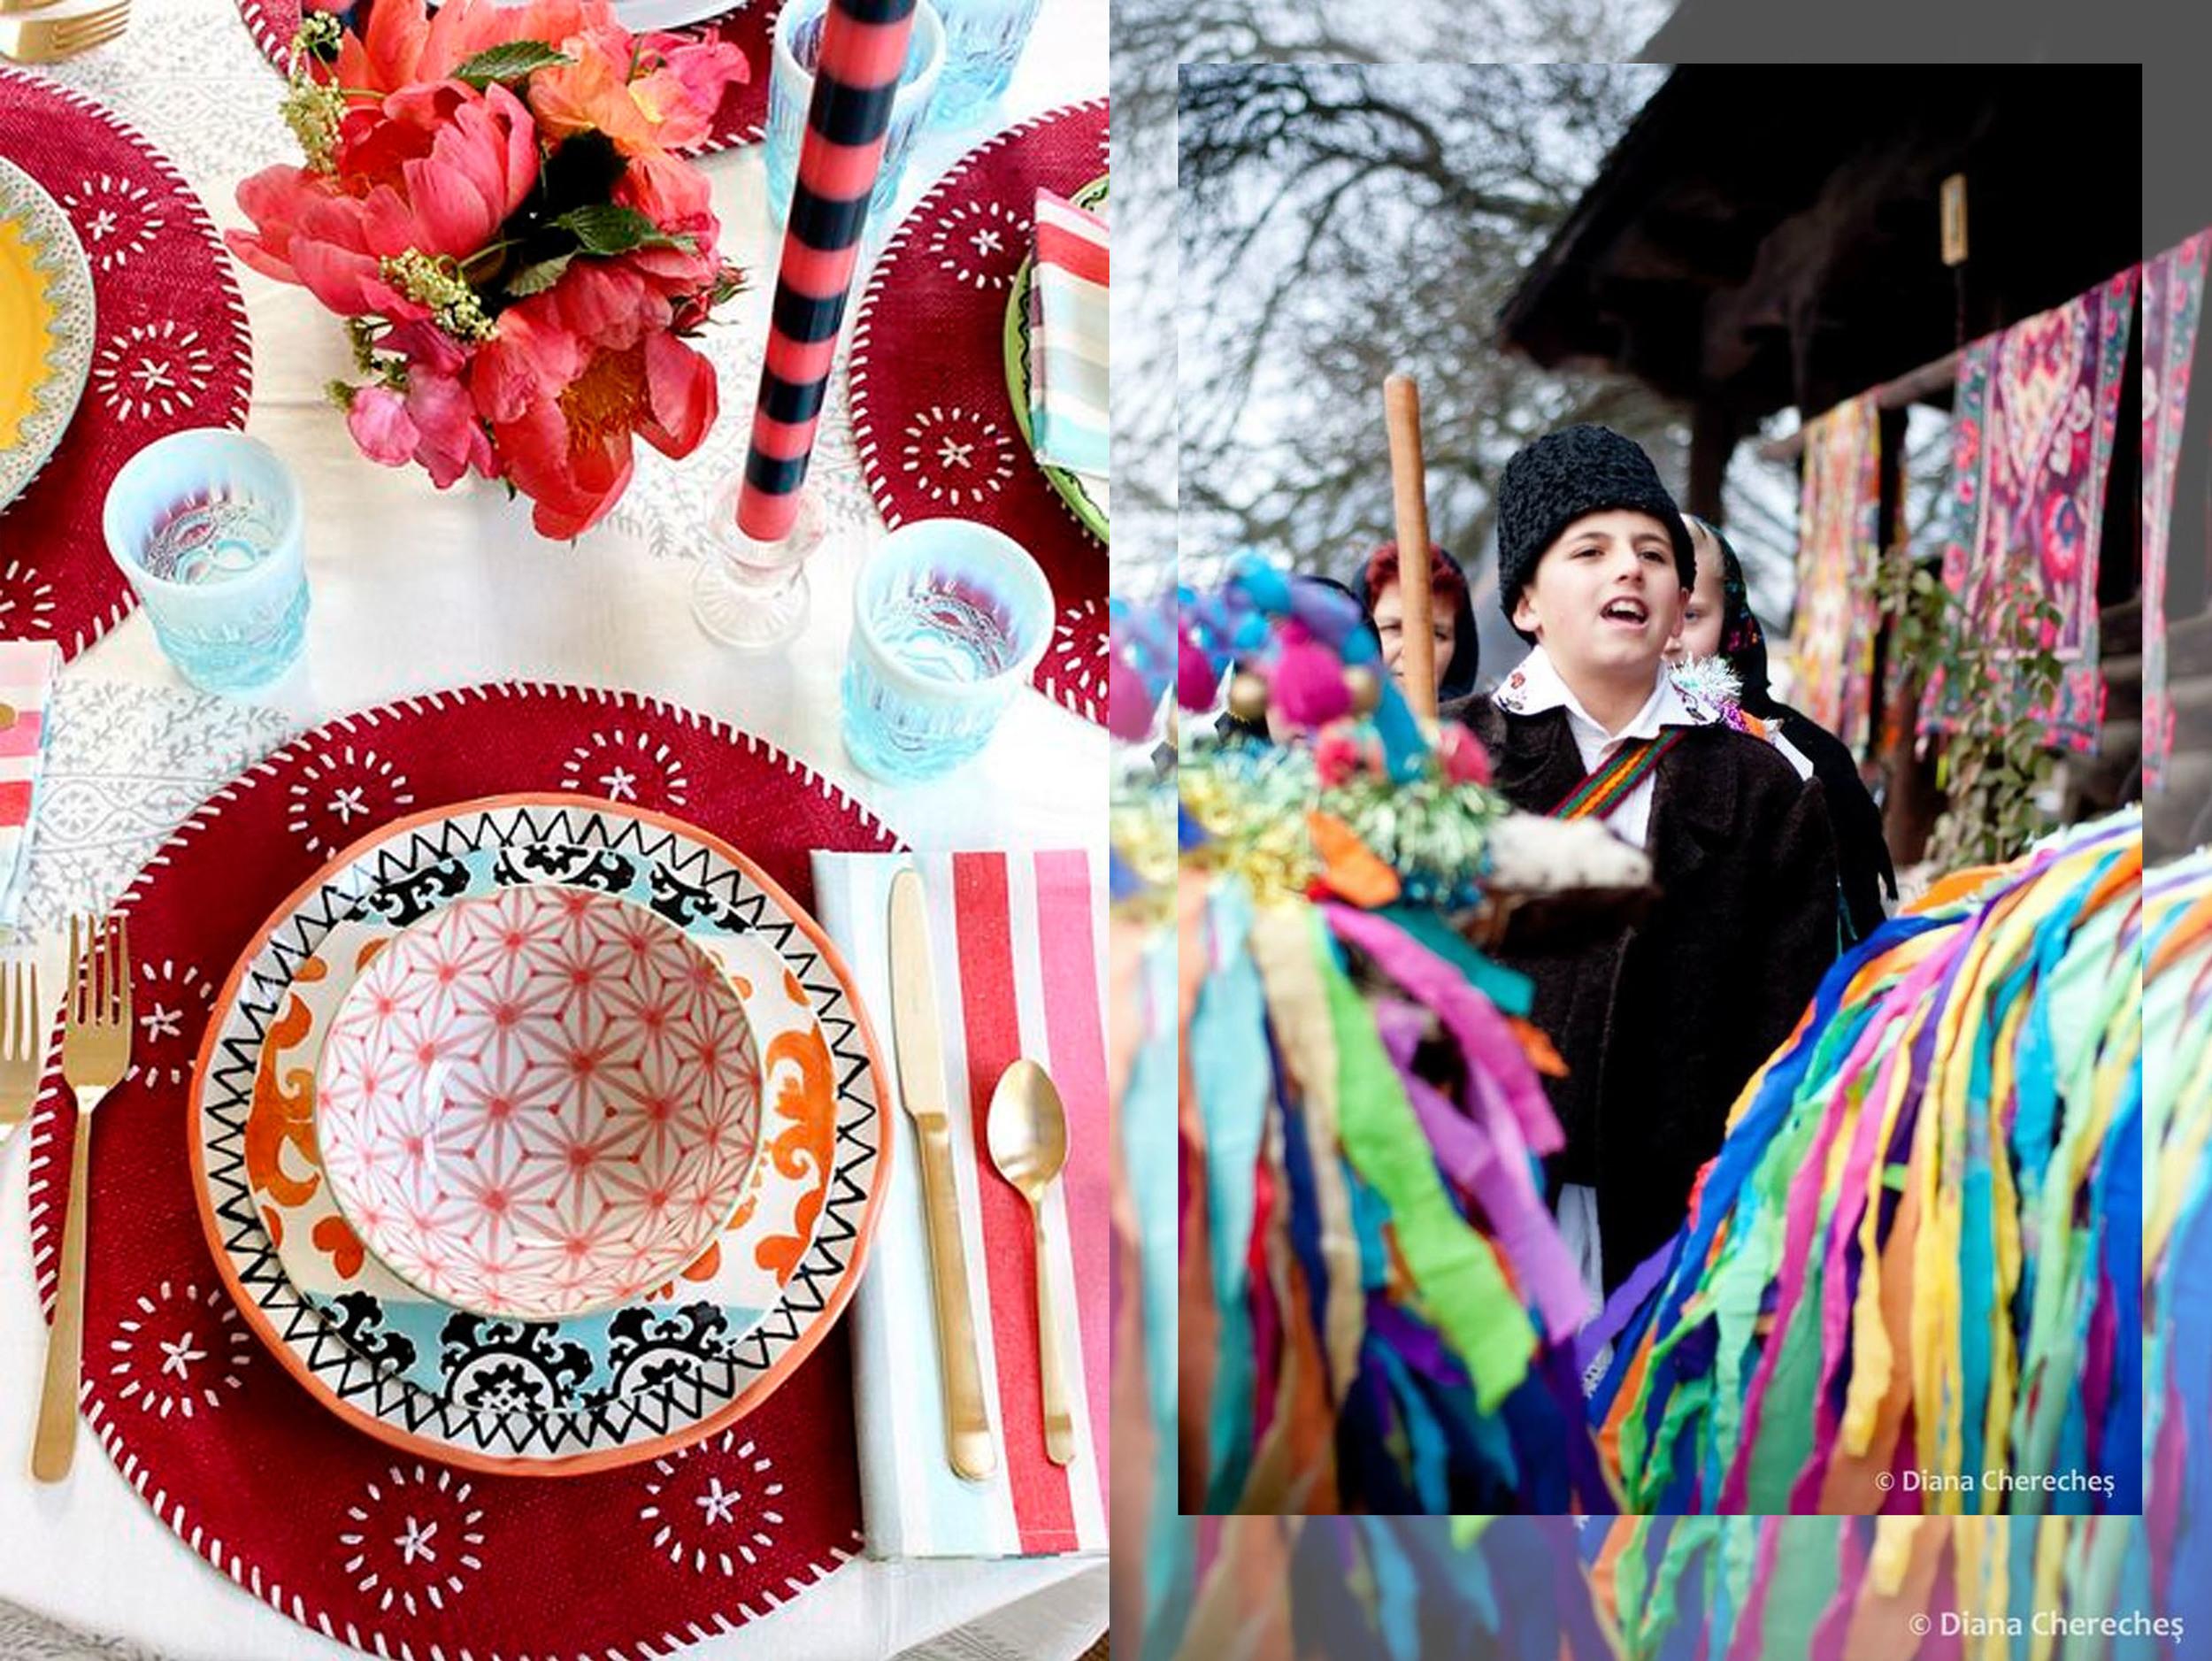 mix of plates  Furbish  - image Maramures  Diana Chereches